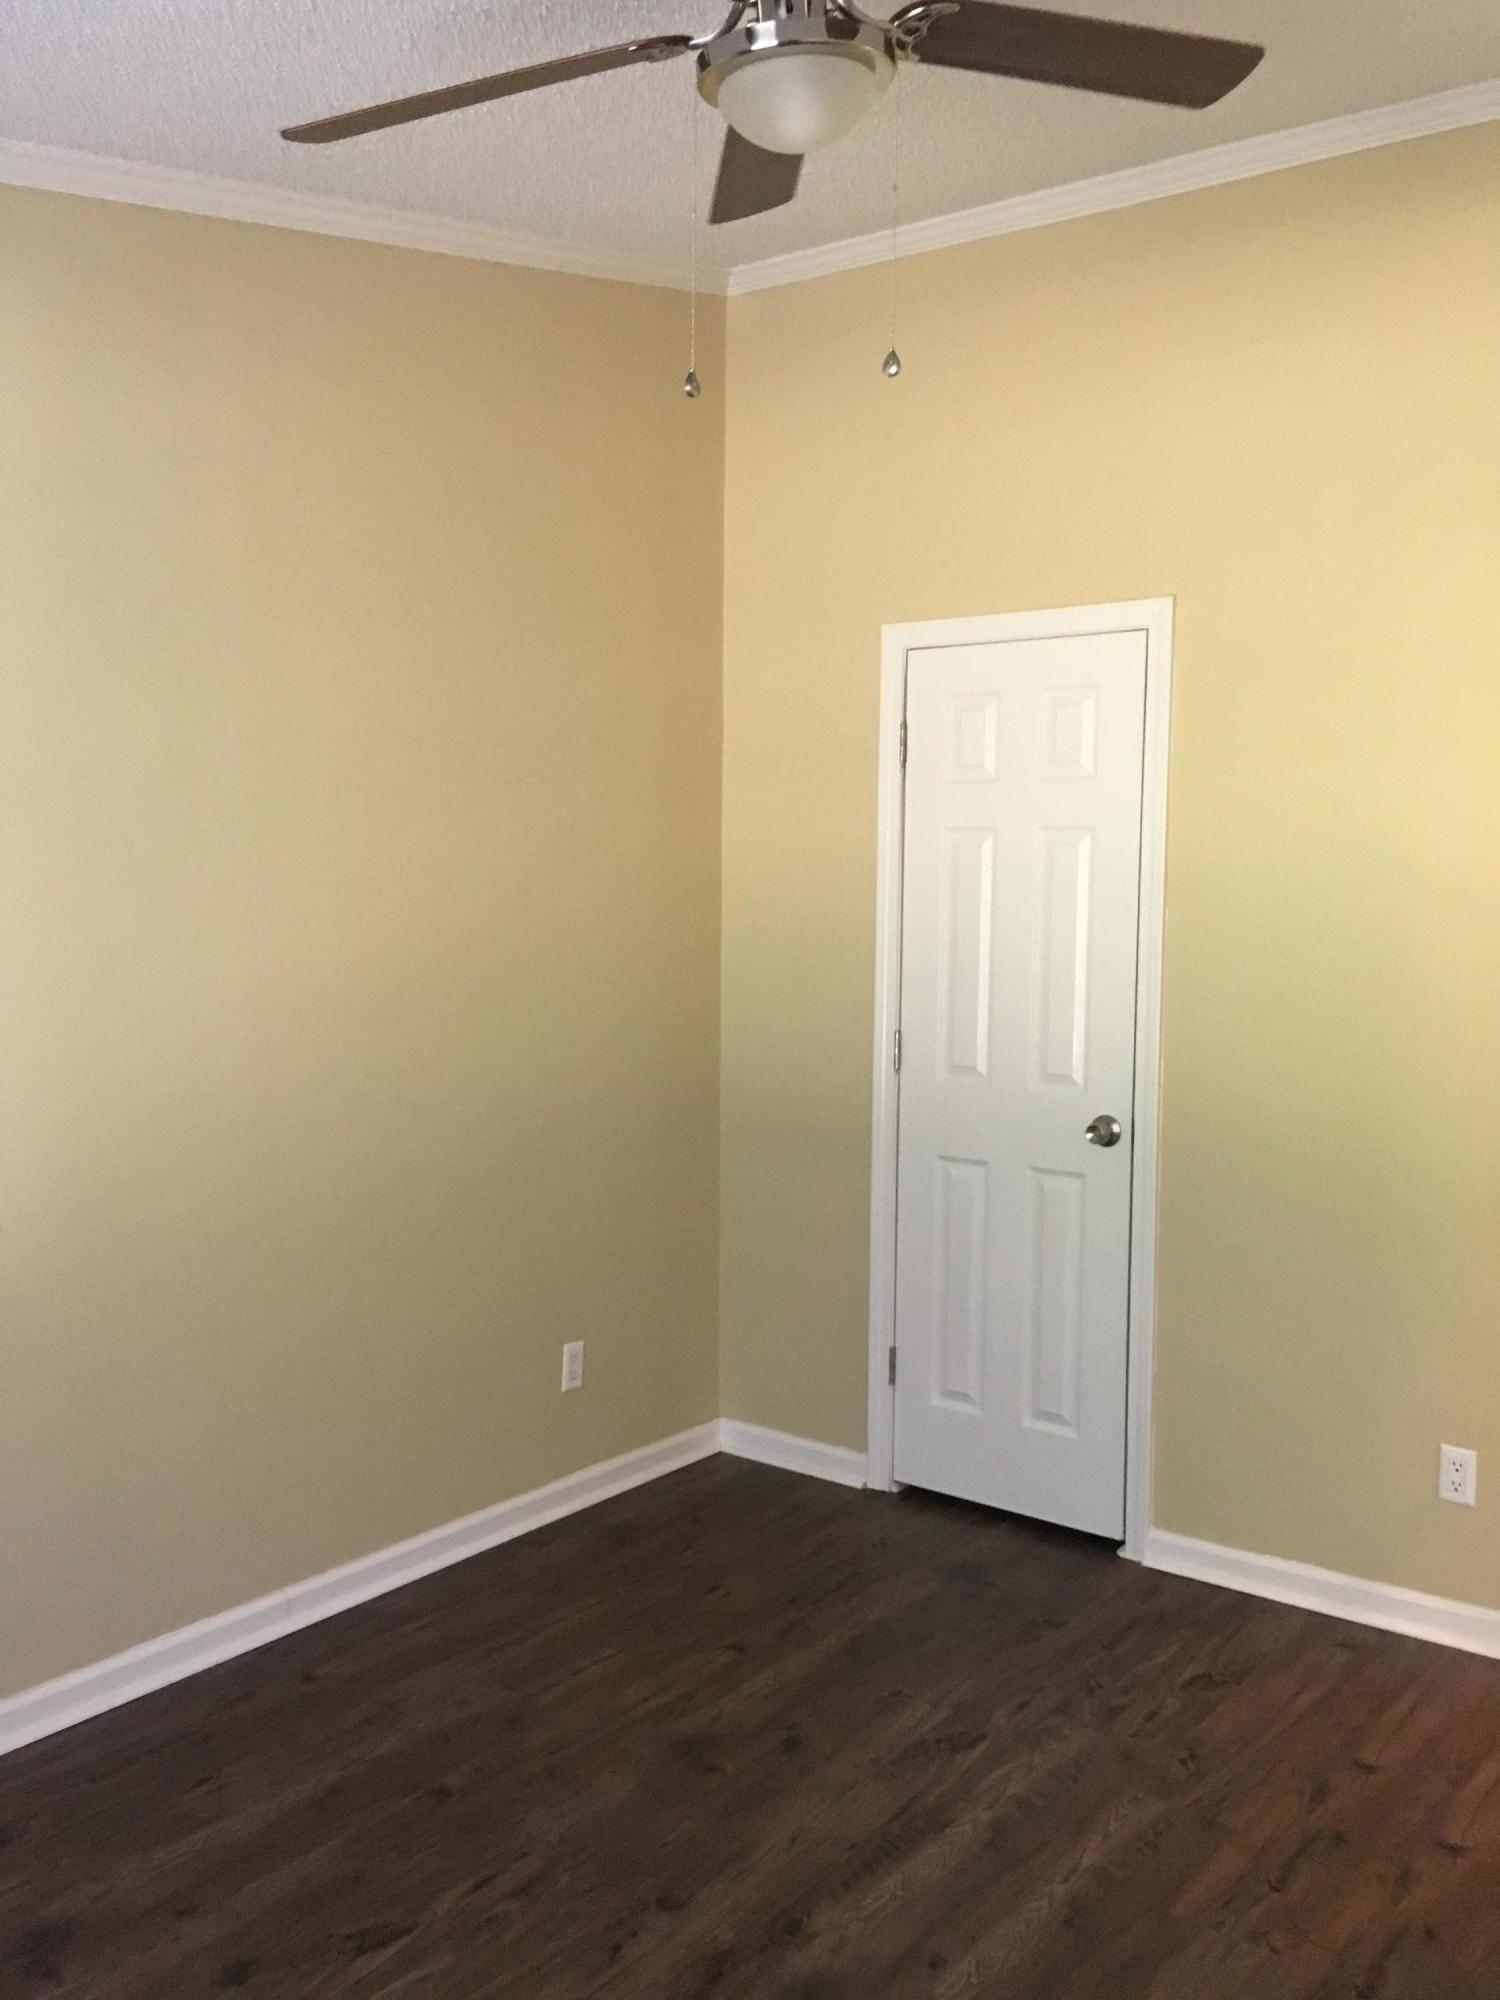 None Homes For Sale - 232 Chance, Cottageville, SC - 36